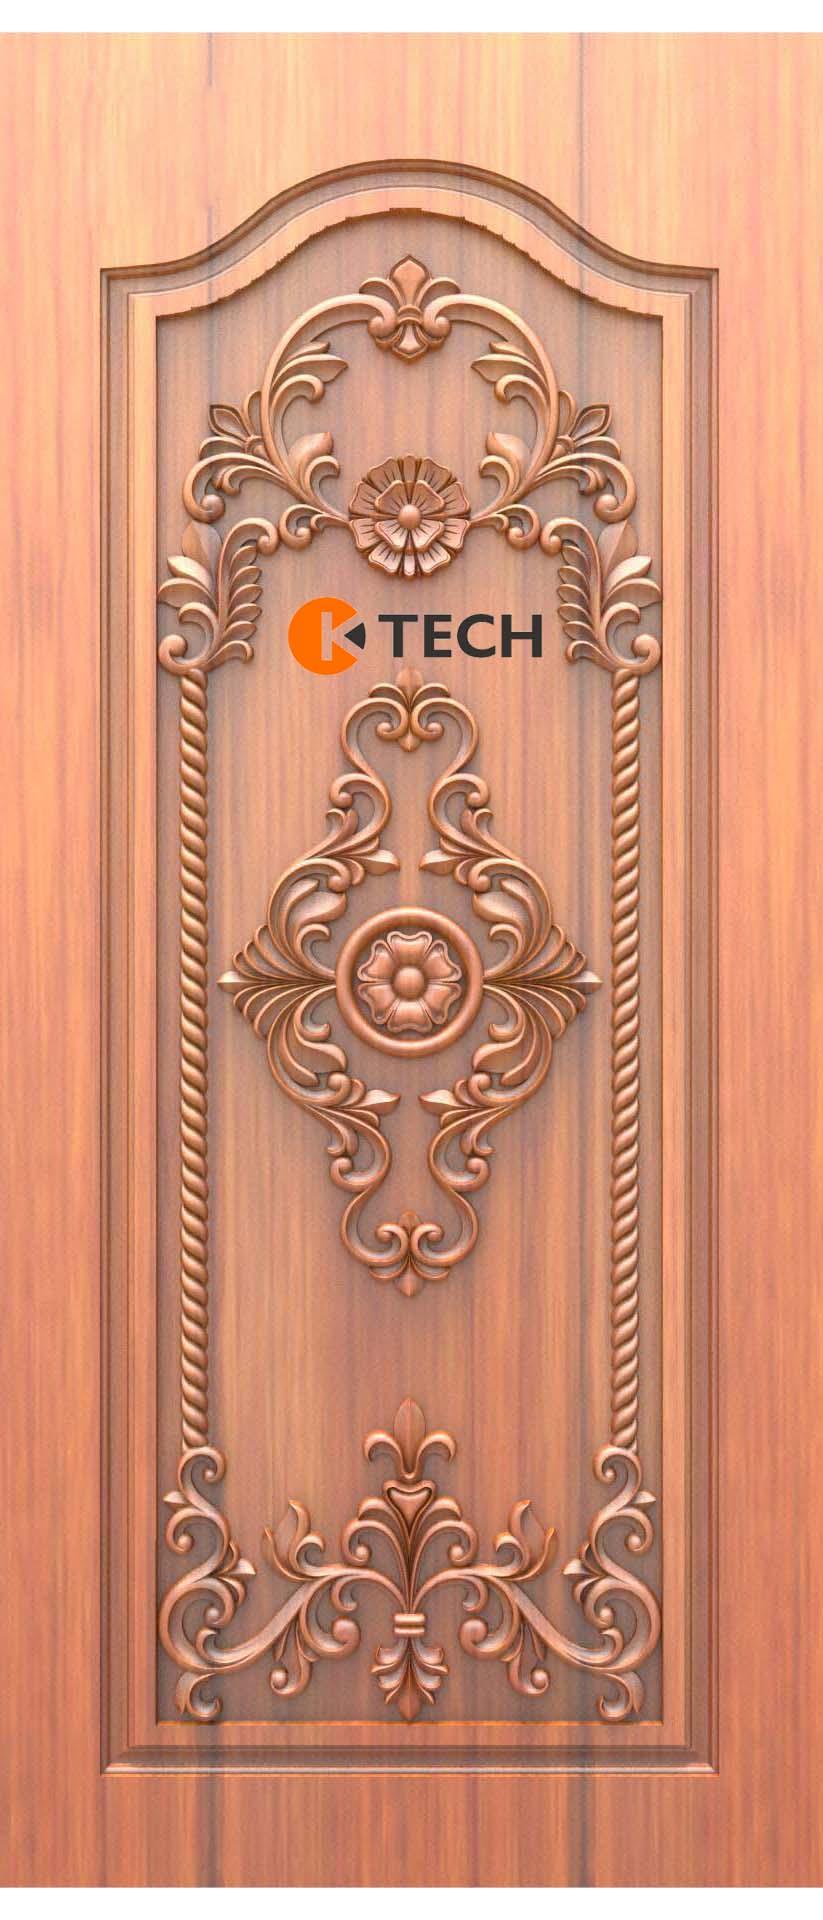 K-TECH CNC Doors Design 175